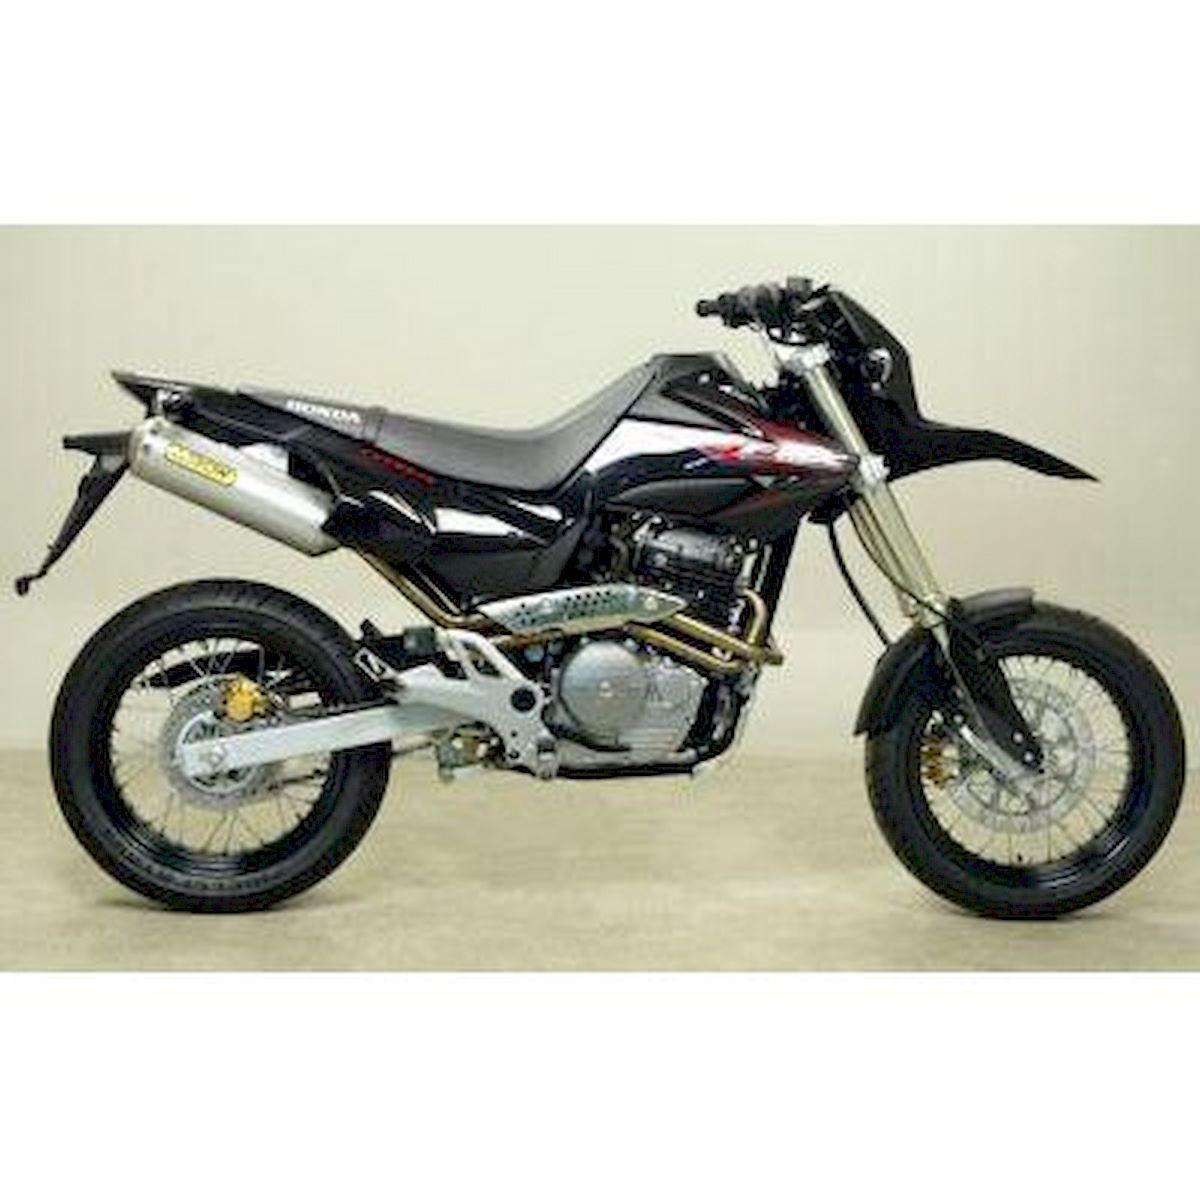 Image of HONDA FMX 650